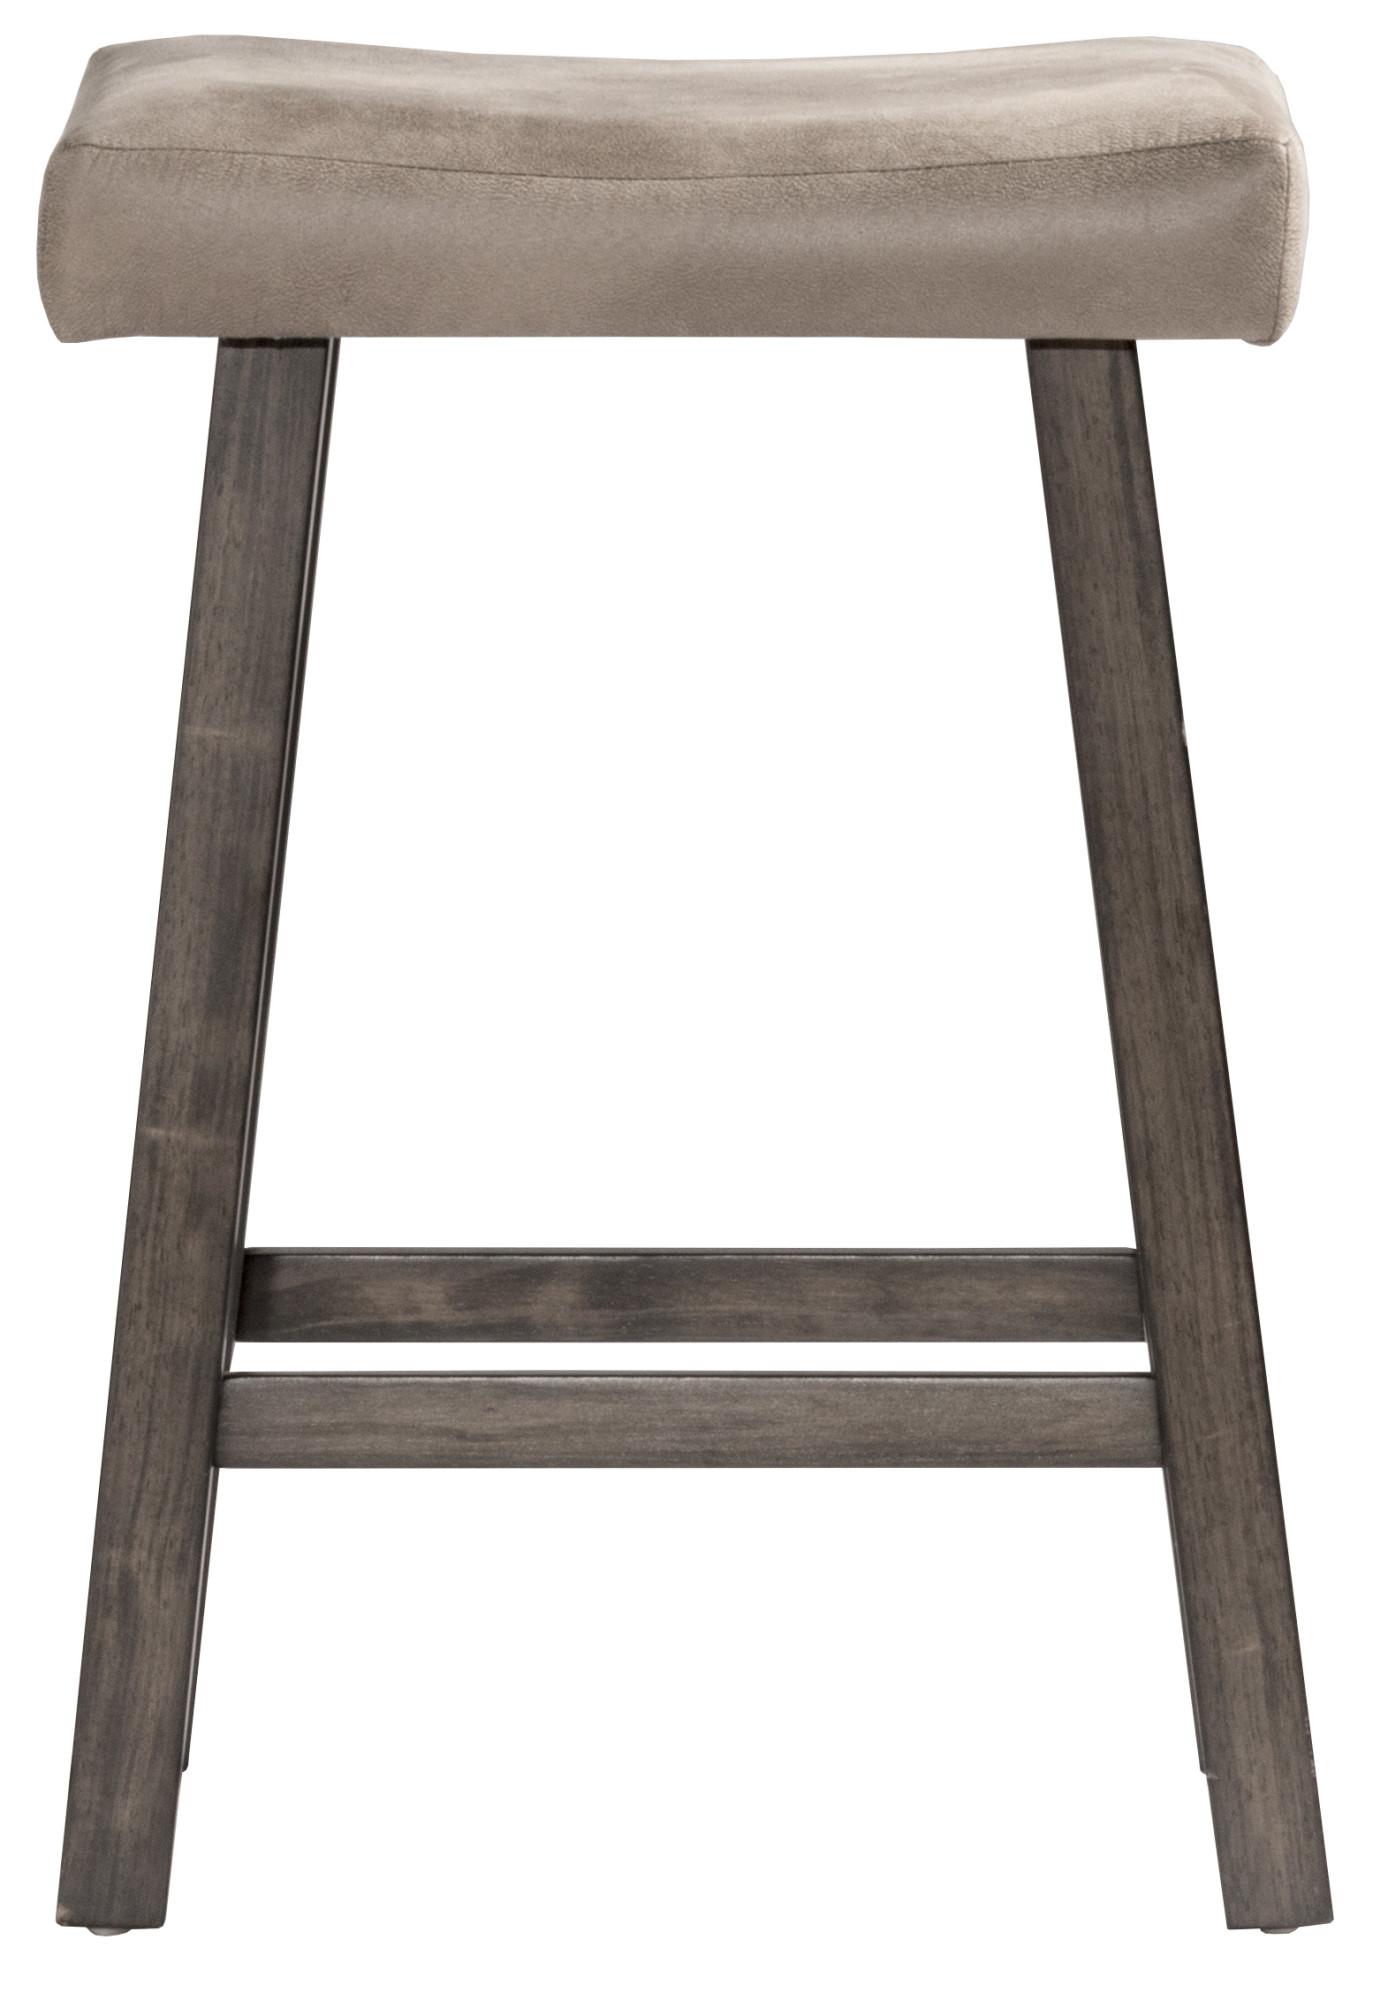 Brilliant Details About Hillsdale Furniture 4621 830 Saddle 18W Wood Framed Polyure Grey Machost Co Dining Chair Design Ideas Machostcouk